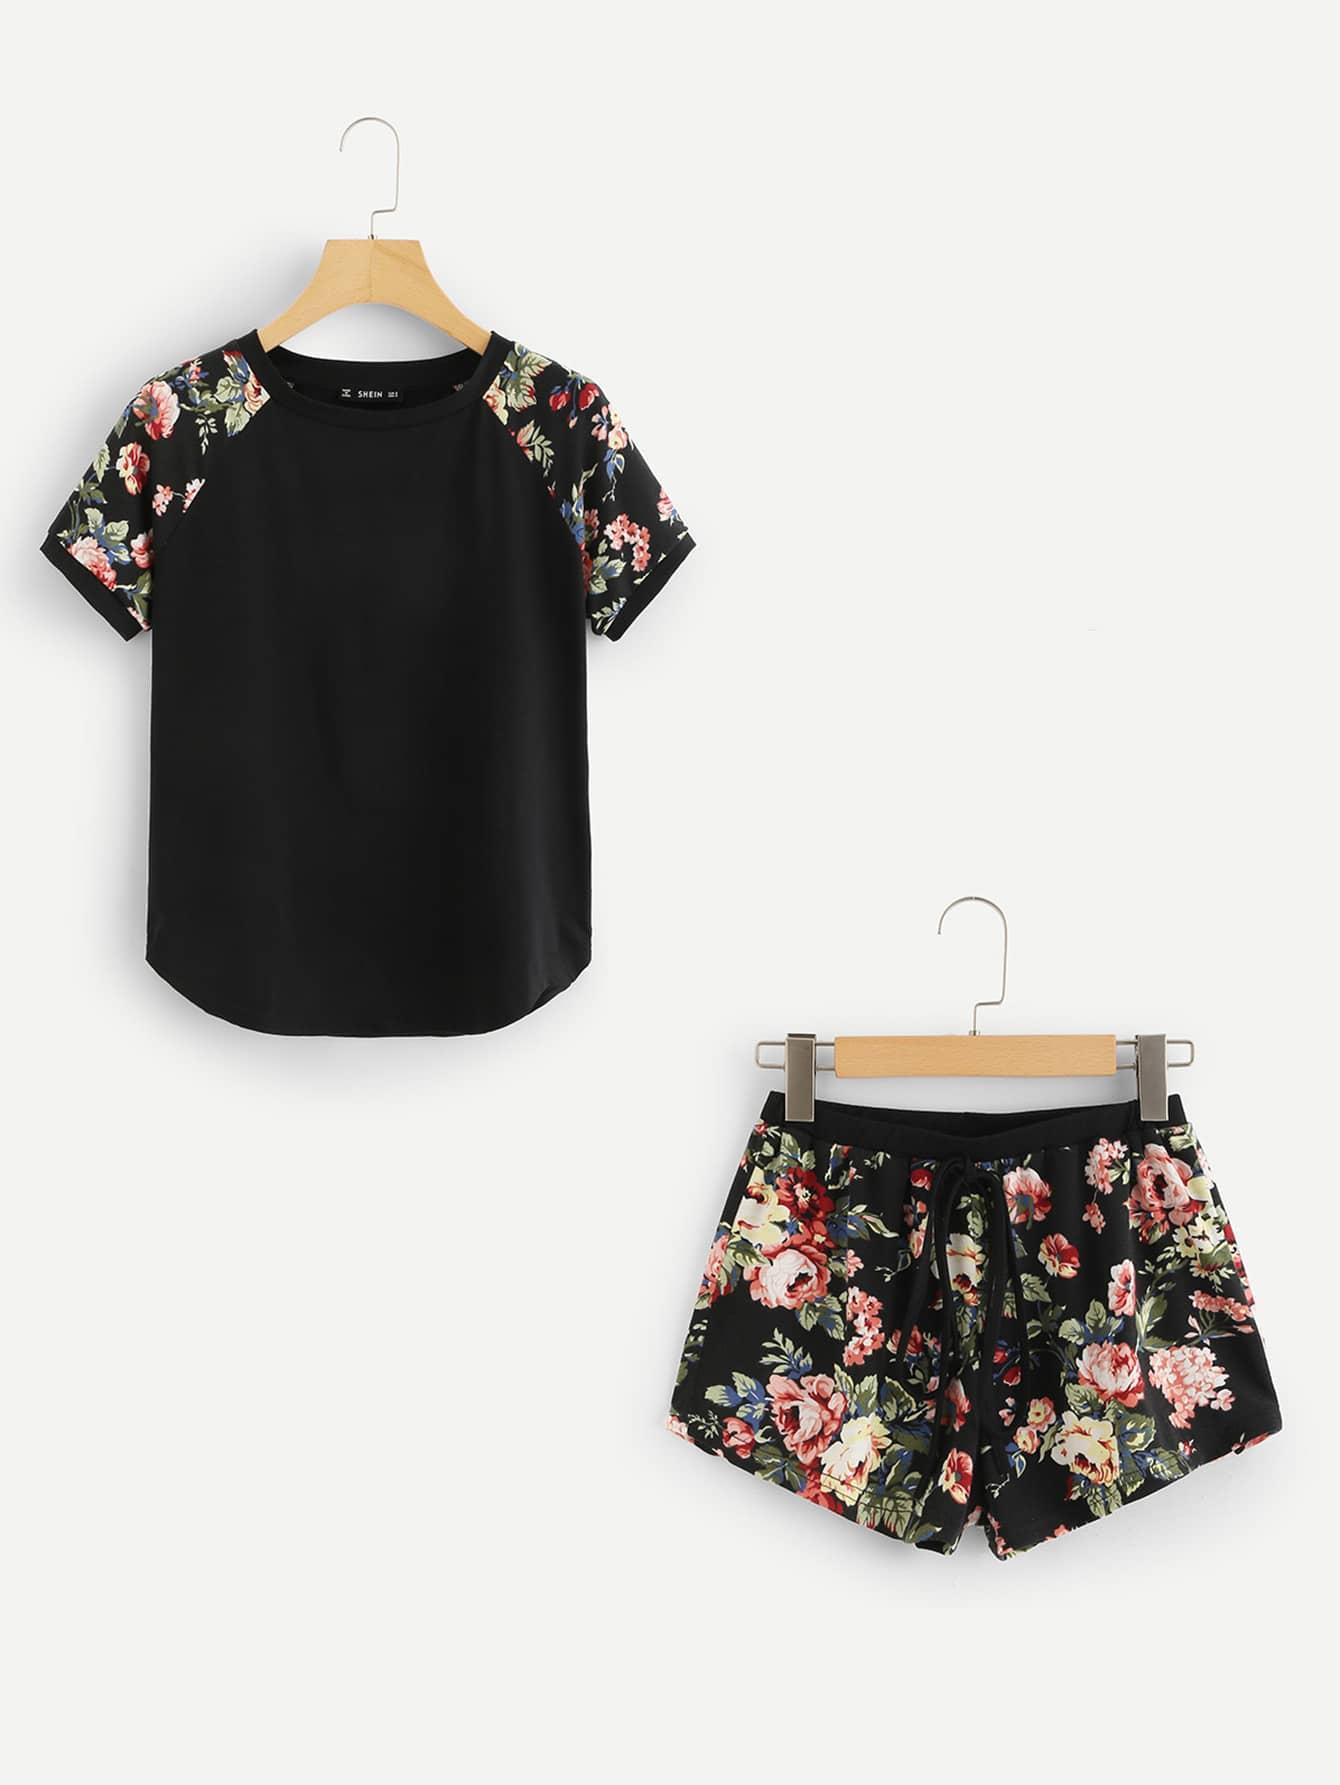 Contrast Raglan Sleeve Curved Hem Top & Floral Shorts PJ Set flamingo embroidered striped top and curved hem shorts set